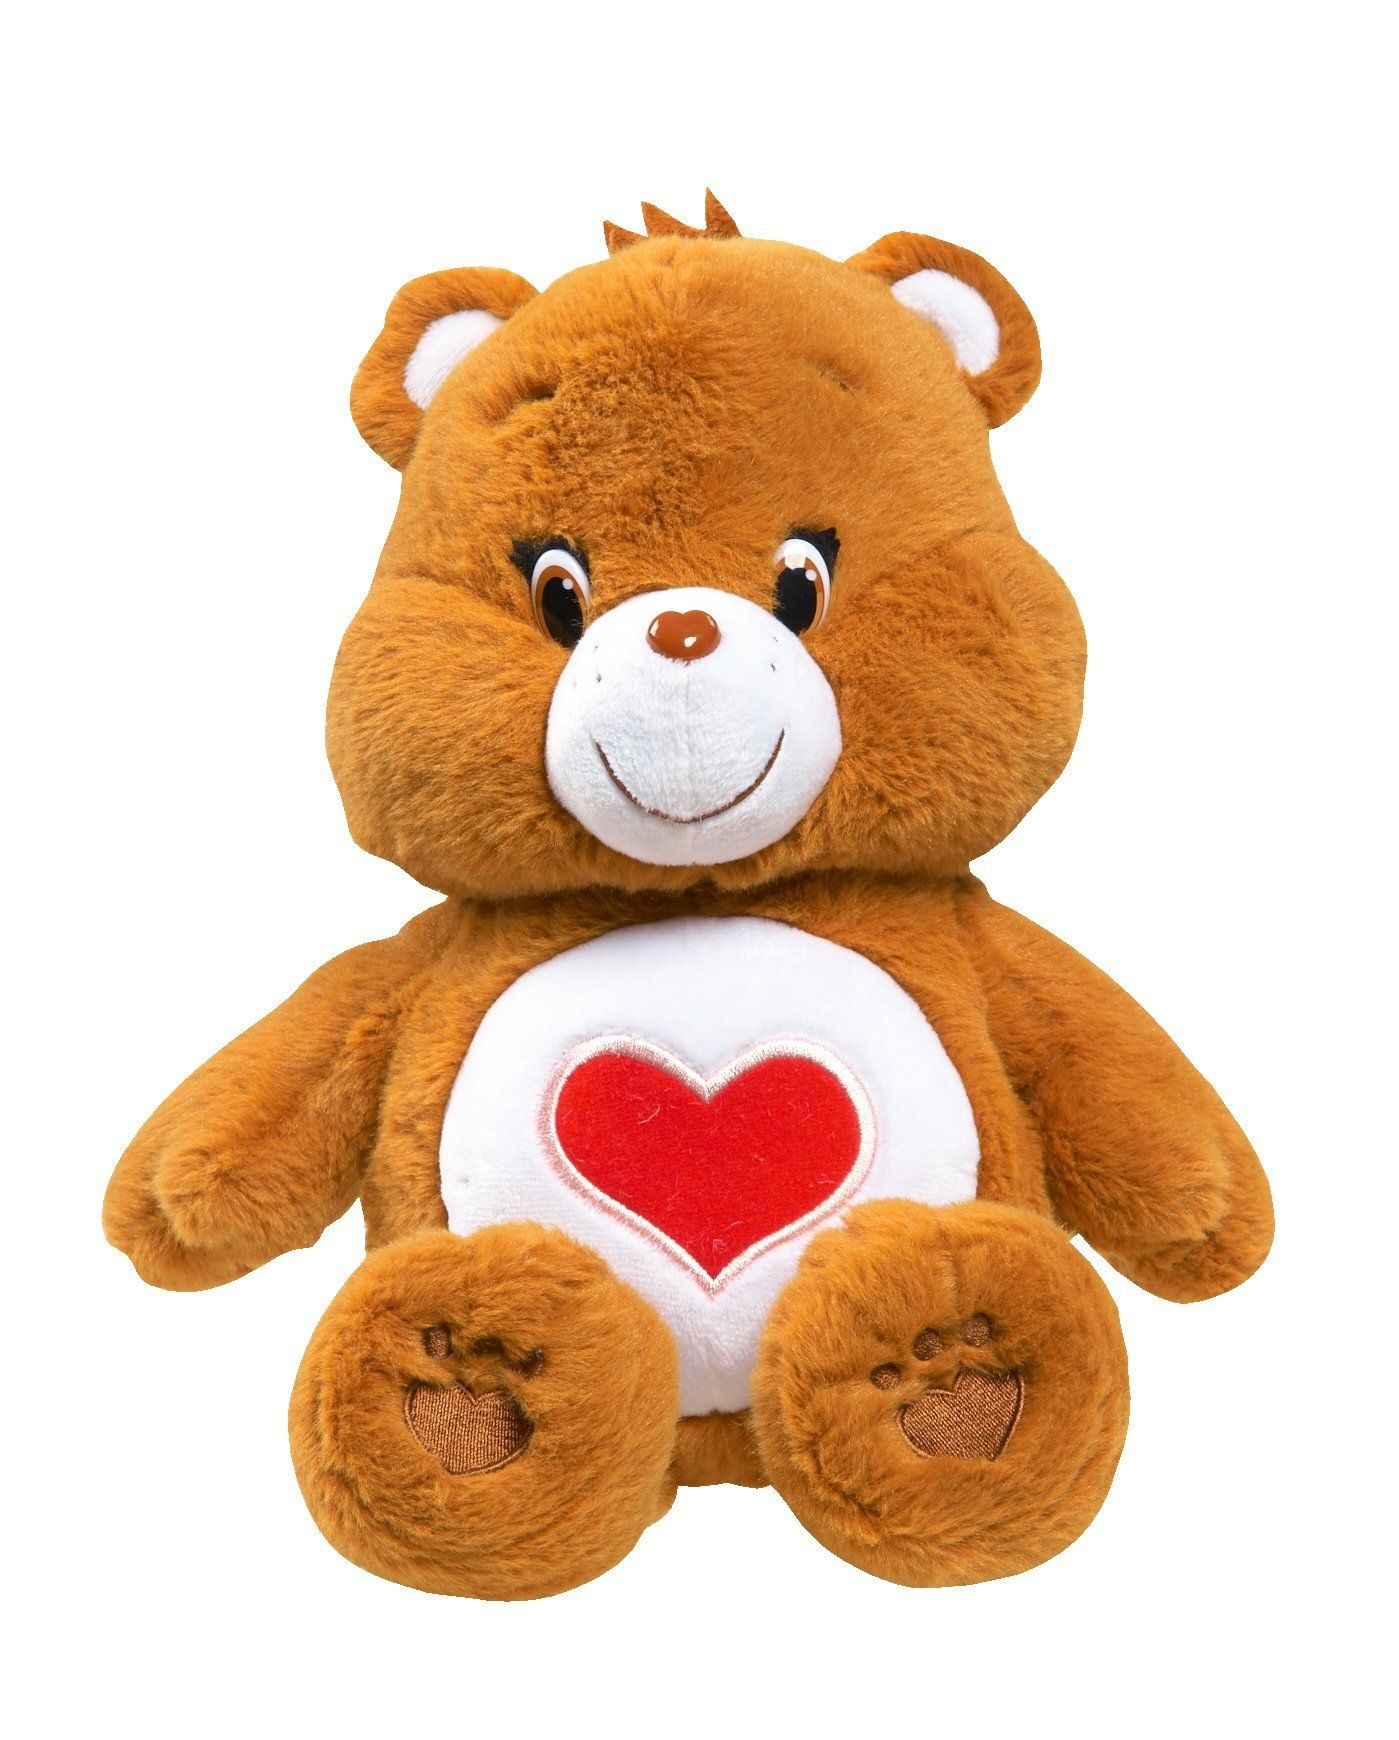 Just Play Care Bears Tenderheart Medium Plush With Dvd Teddy Bear Stuffed Animal Care Bear Cute Stuffed Animals [ 1740 x 1399 Pixel ]